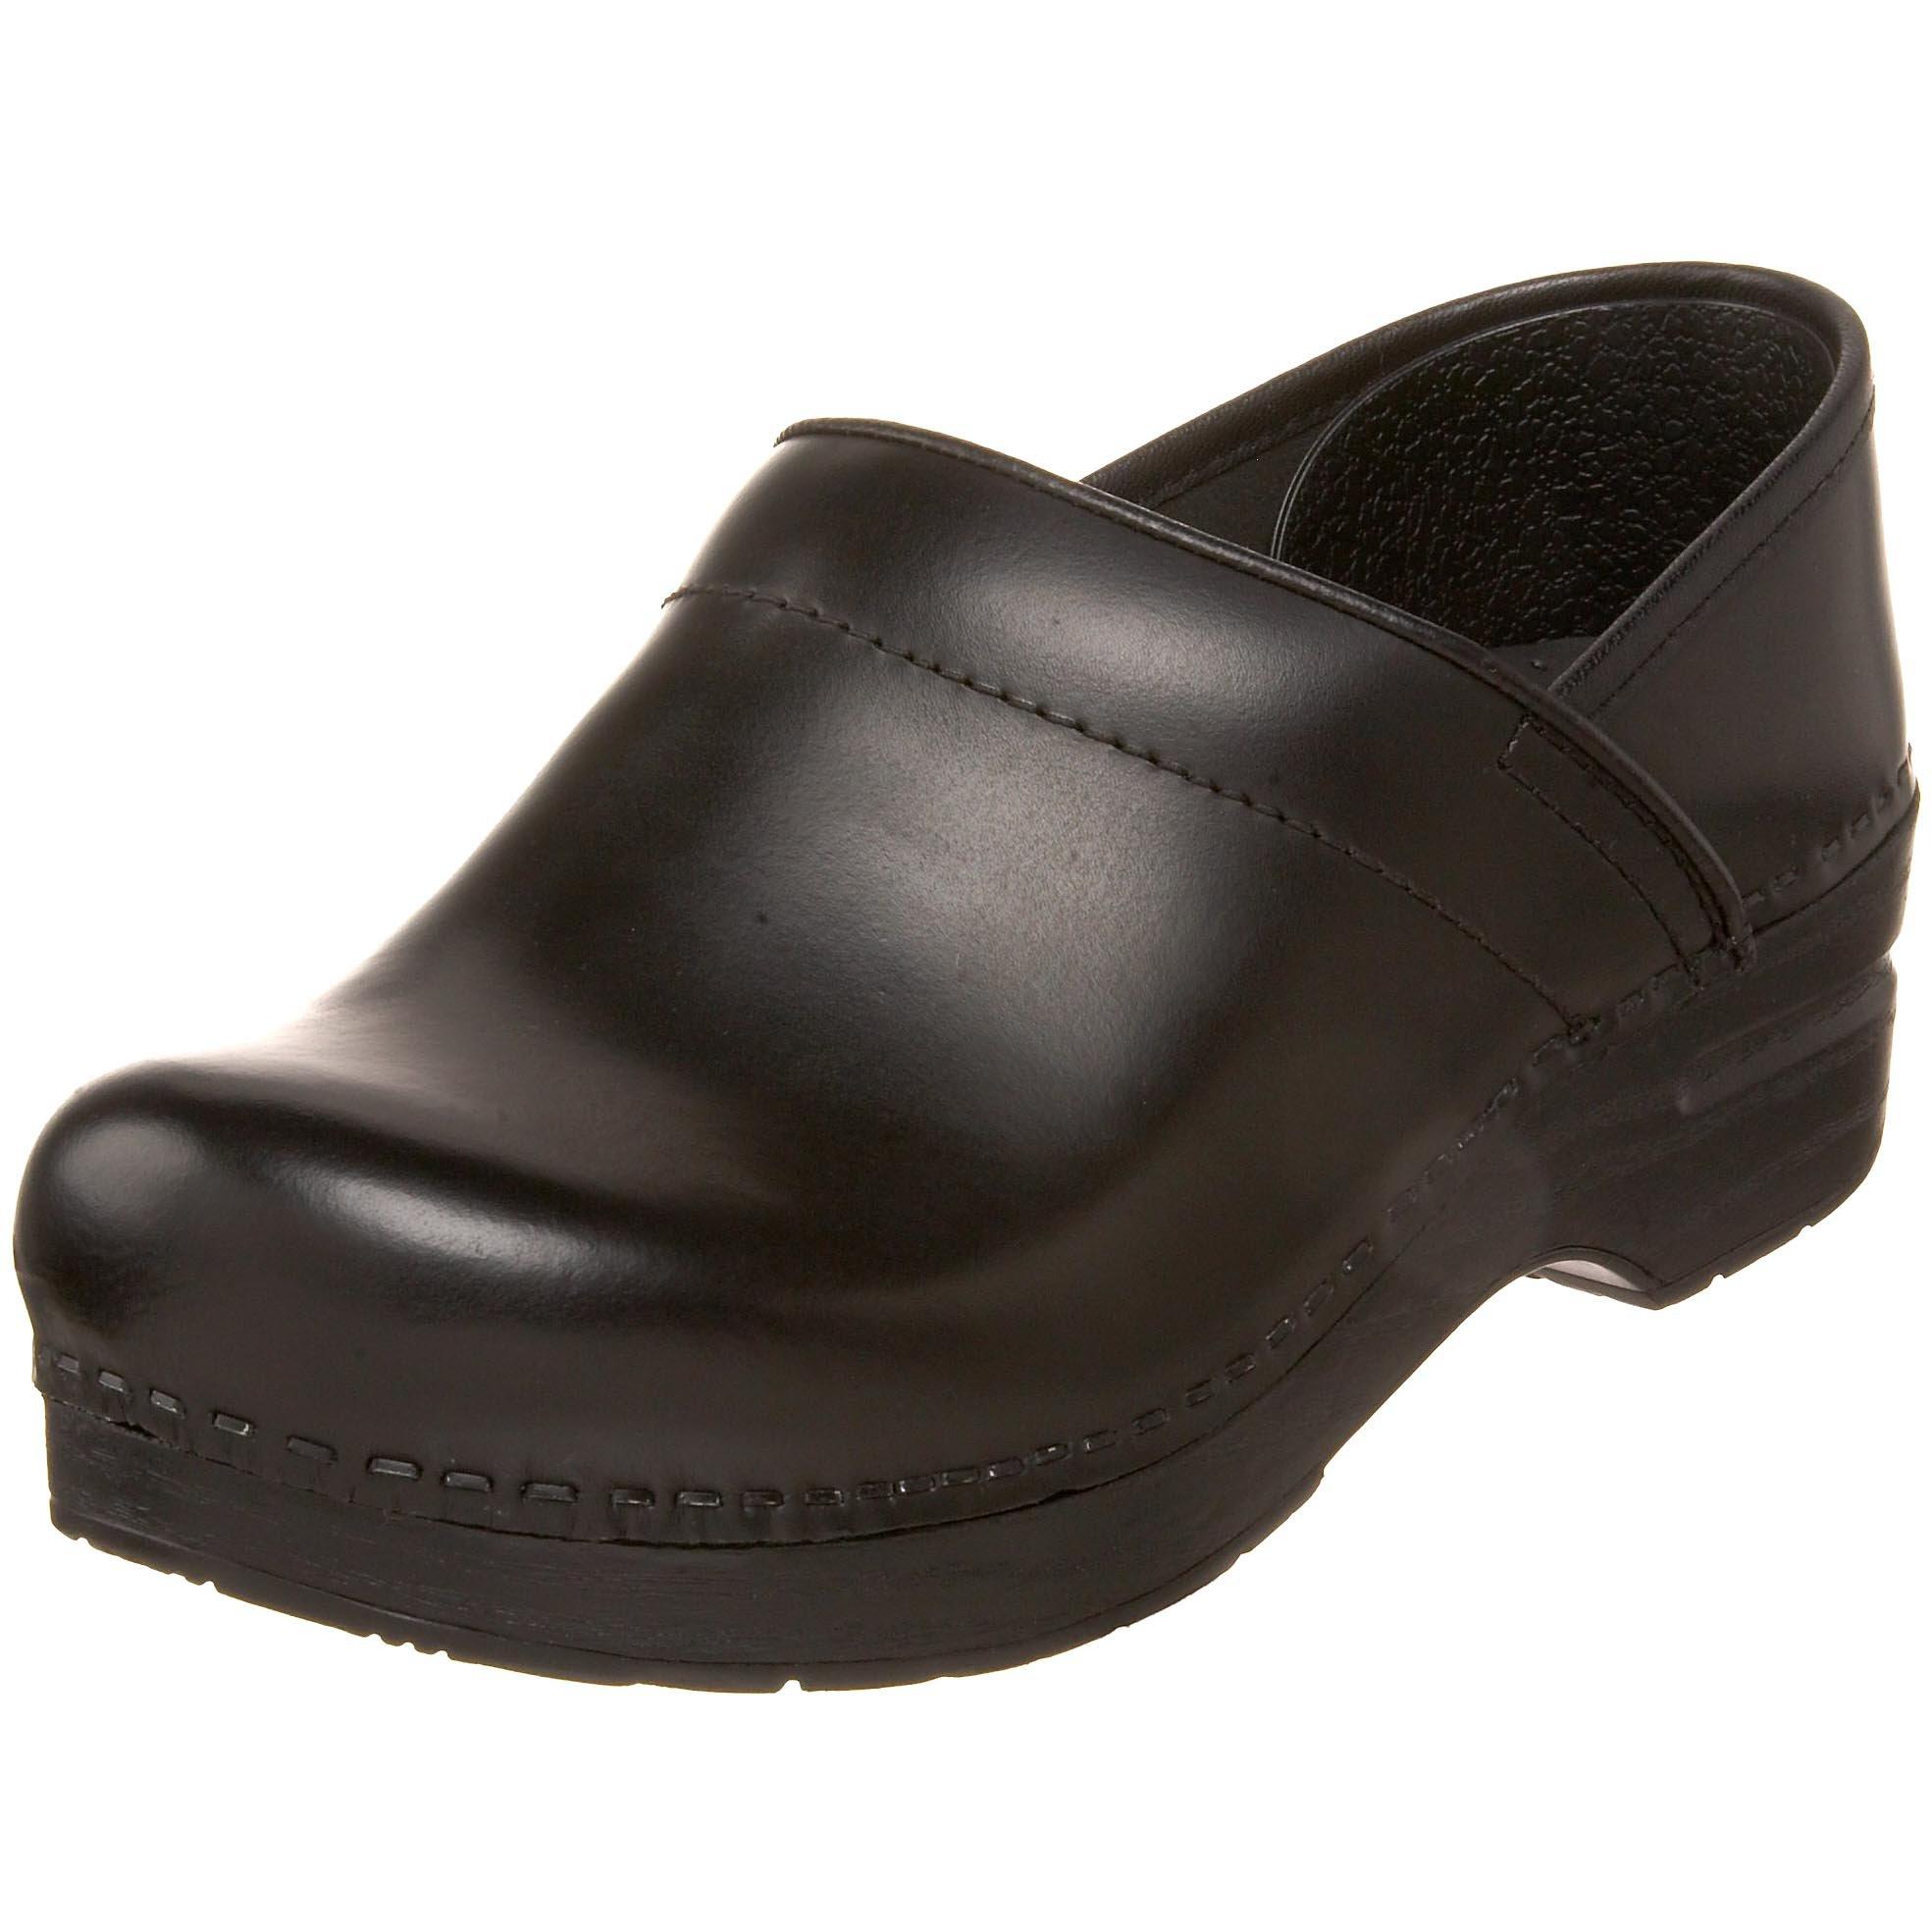 Dansko Women's Wide Professional Clog,Black Cabrio,38 W EU / 7.5-8 D(W) US